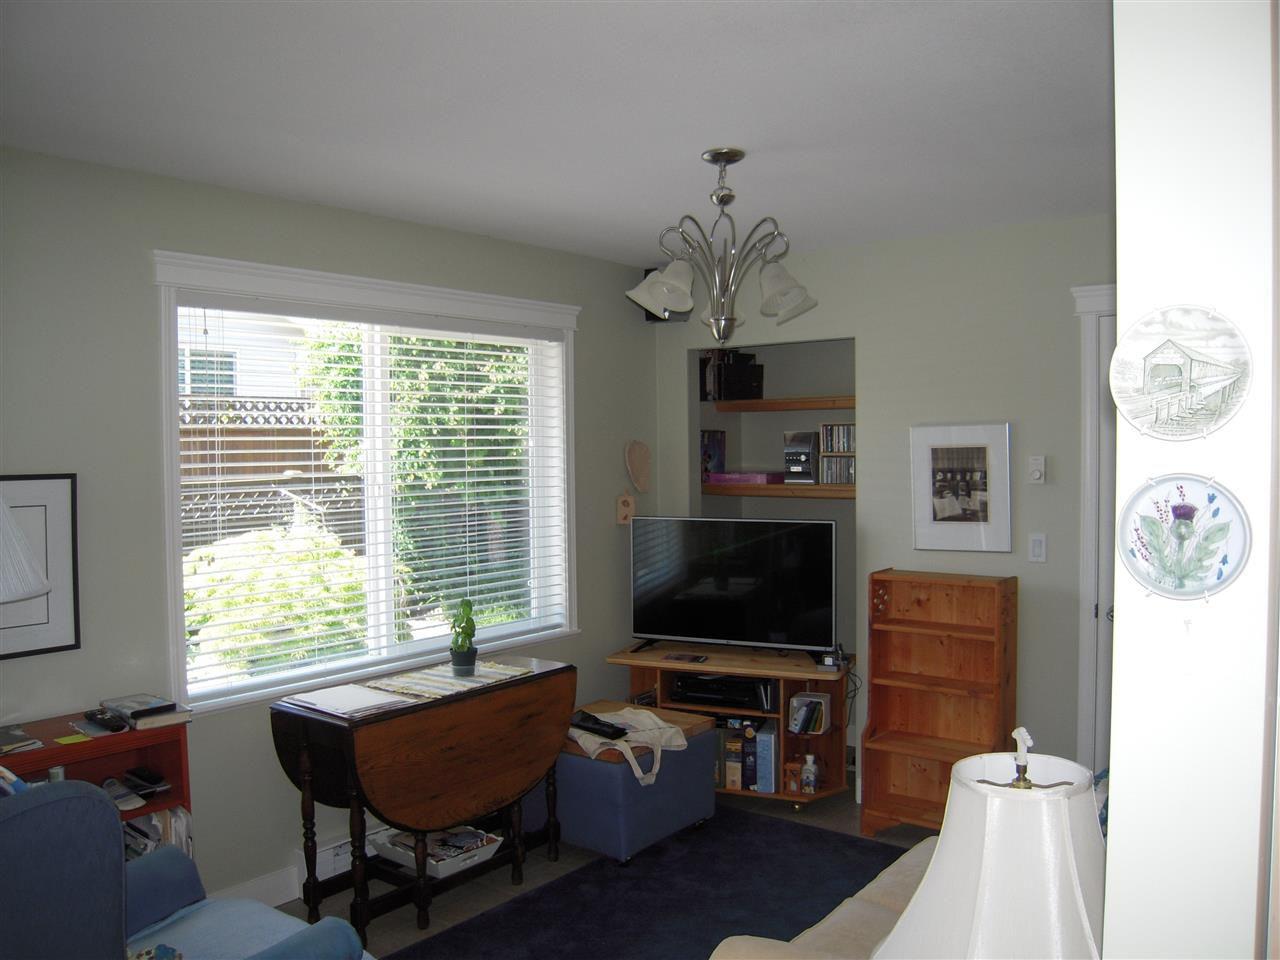 Photo 16: Photos: 5735 EMILY Way in Sechelt: Sechelt District House for sale (Sunshine Coast)  : MLS®# R2179124